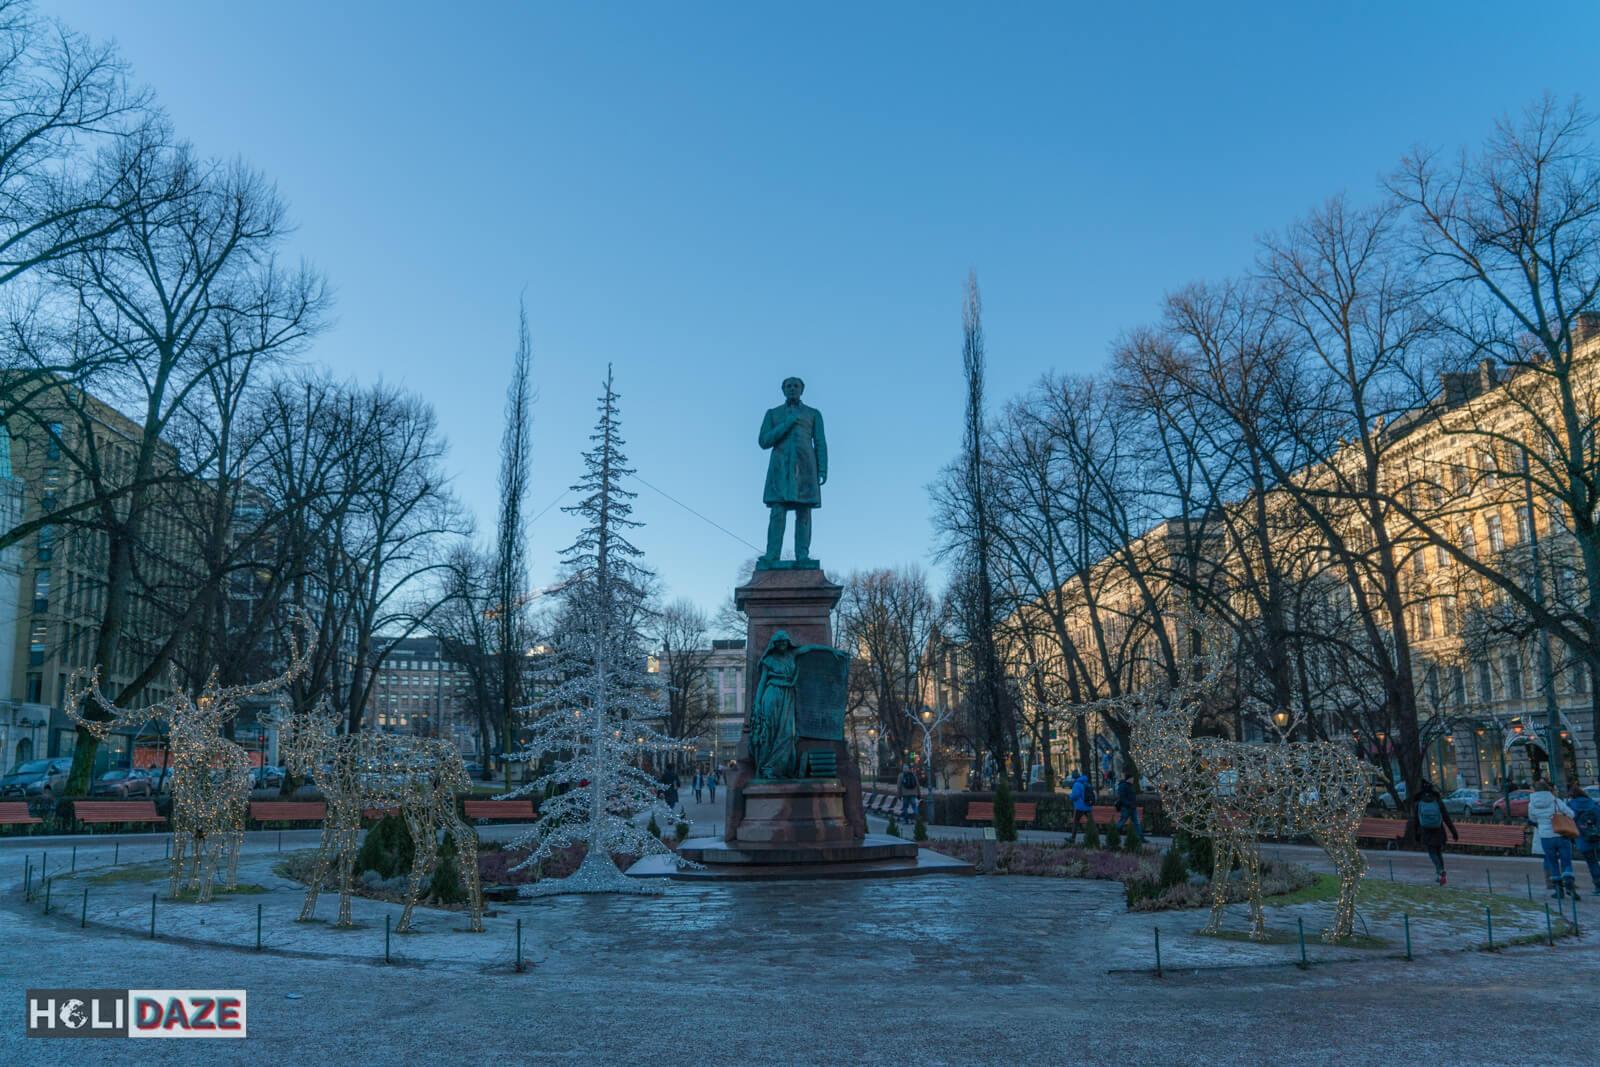 Statue at the center of Esplanadi, the park promenade in downtown Helsinki near Central Market